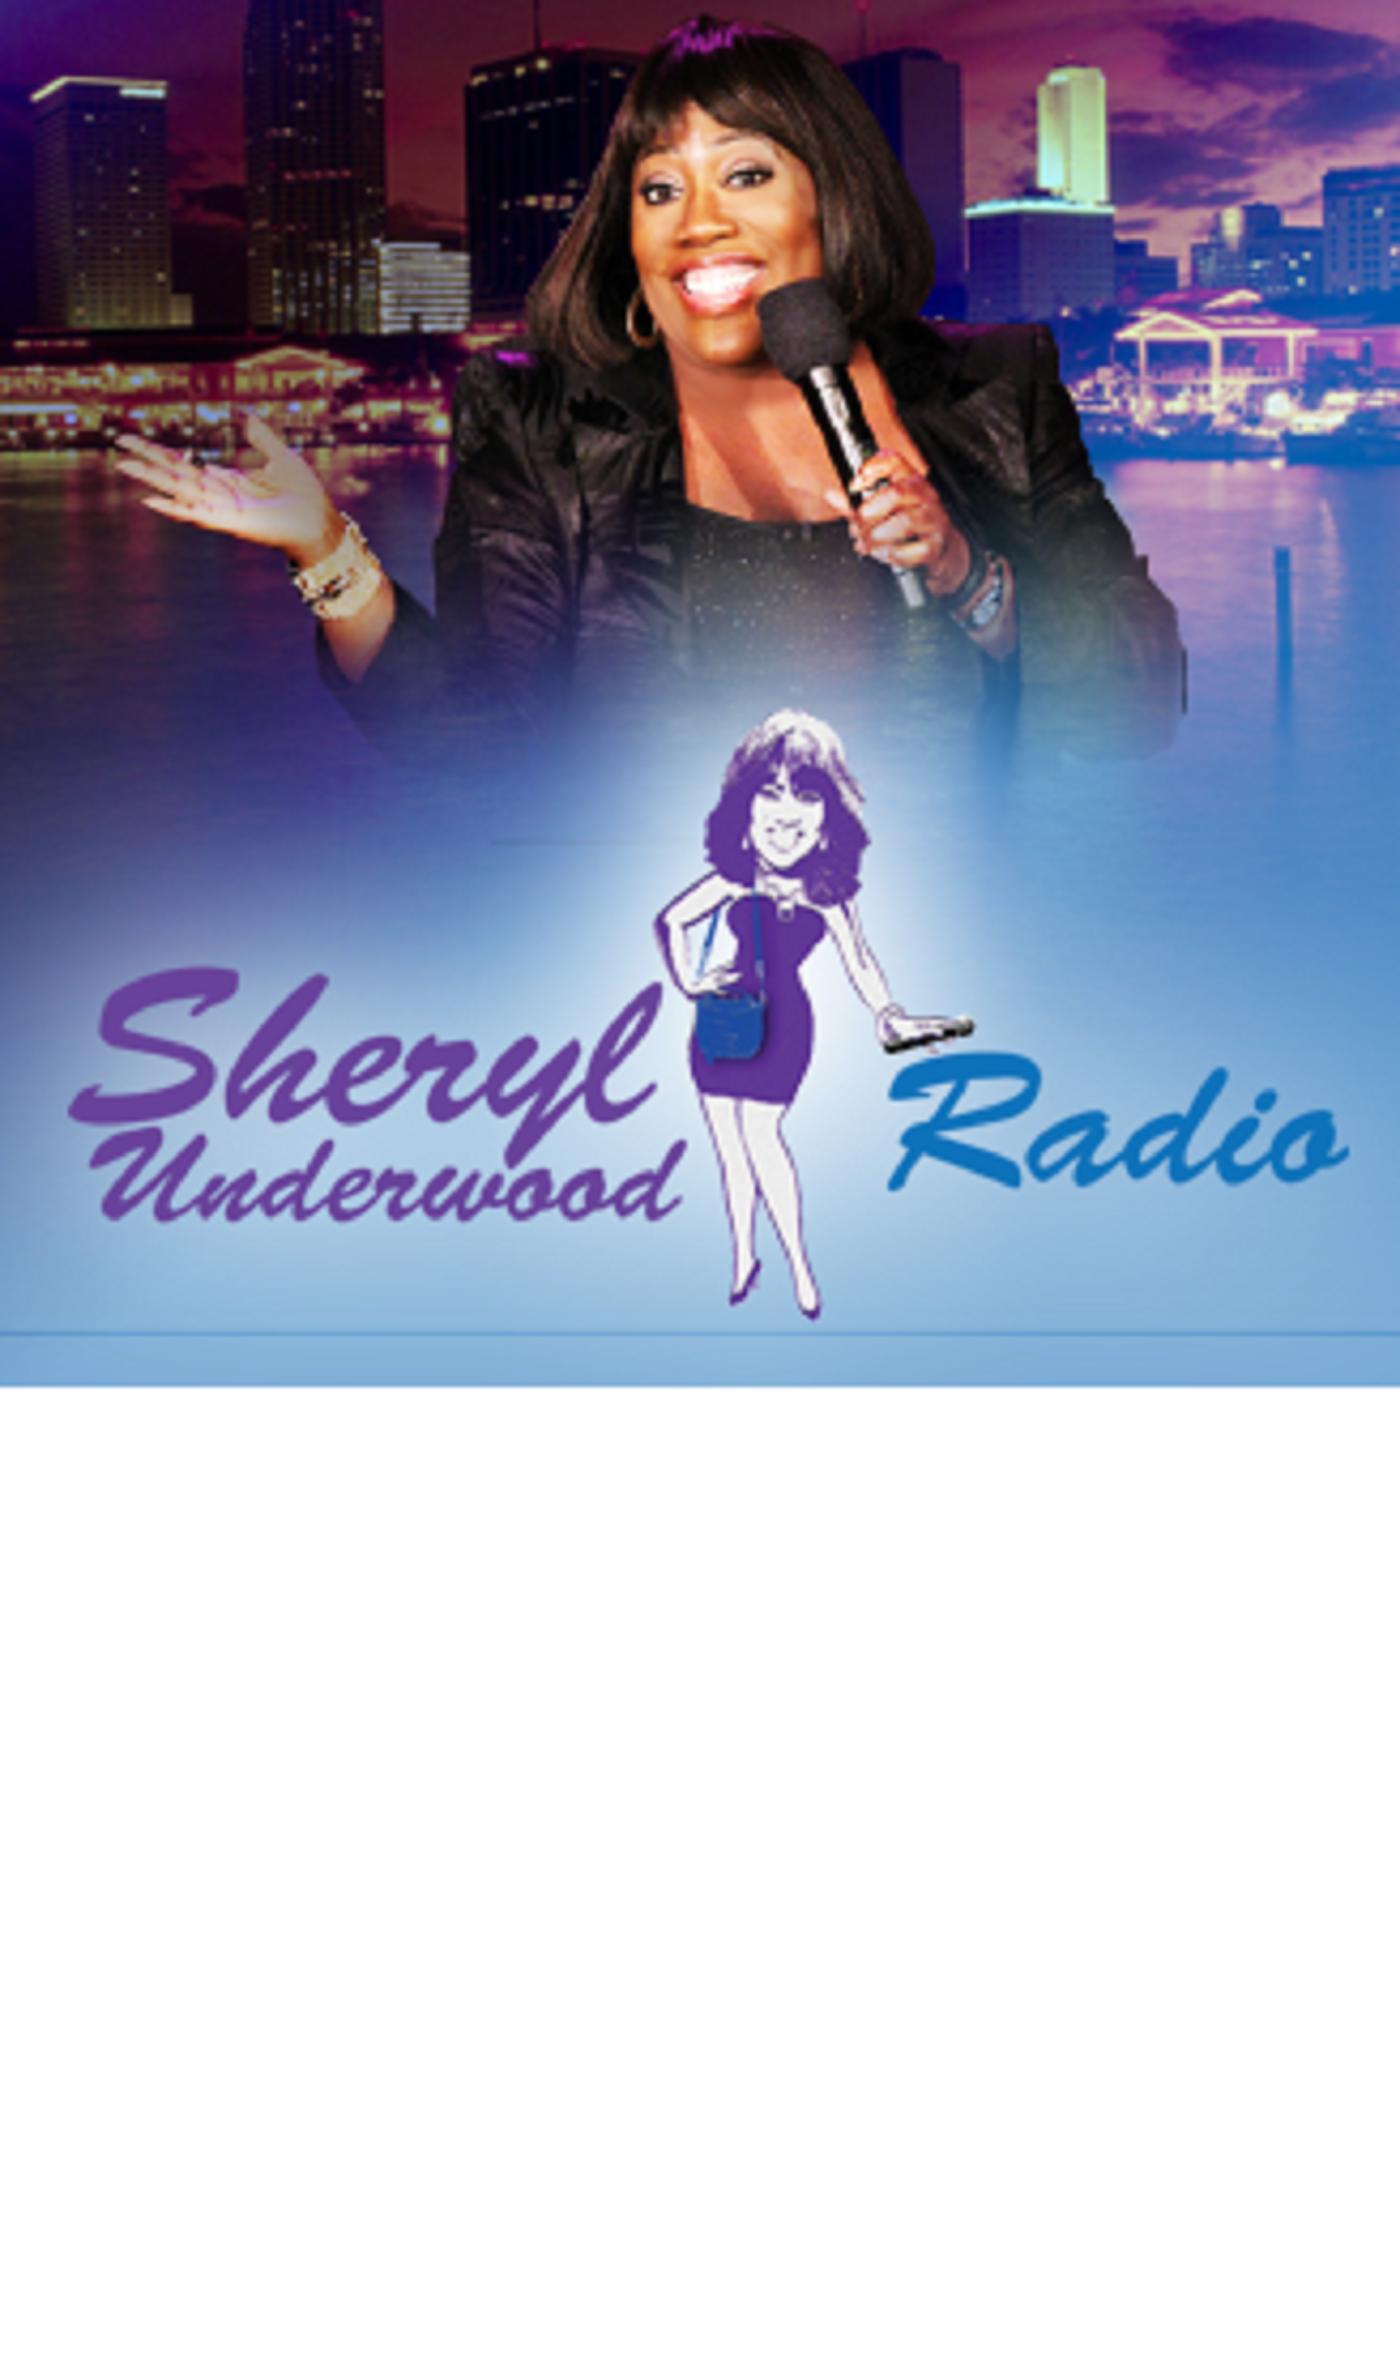 sherylunderwoodradio's podcast